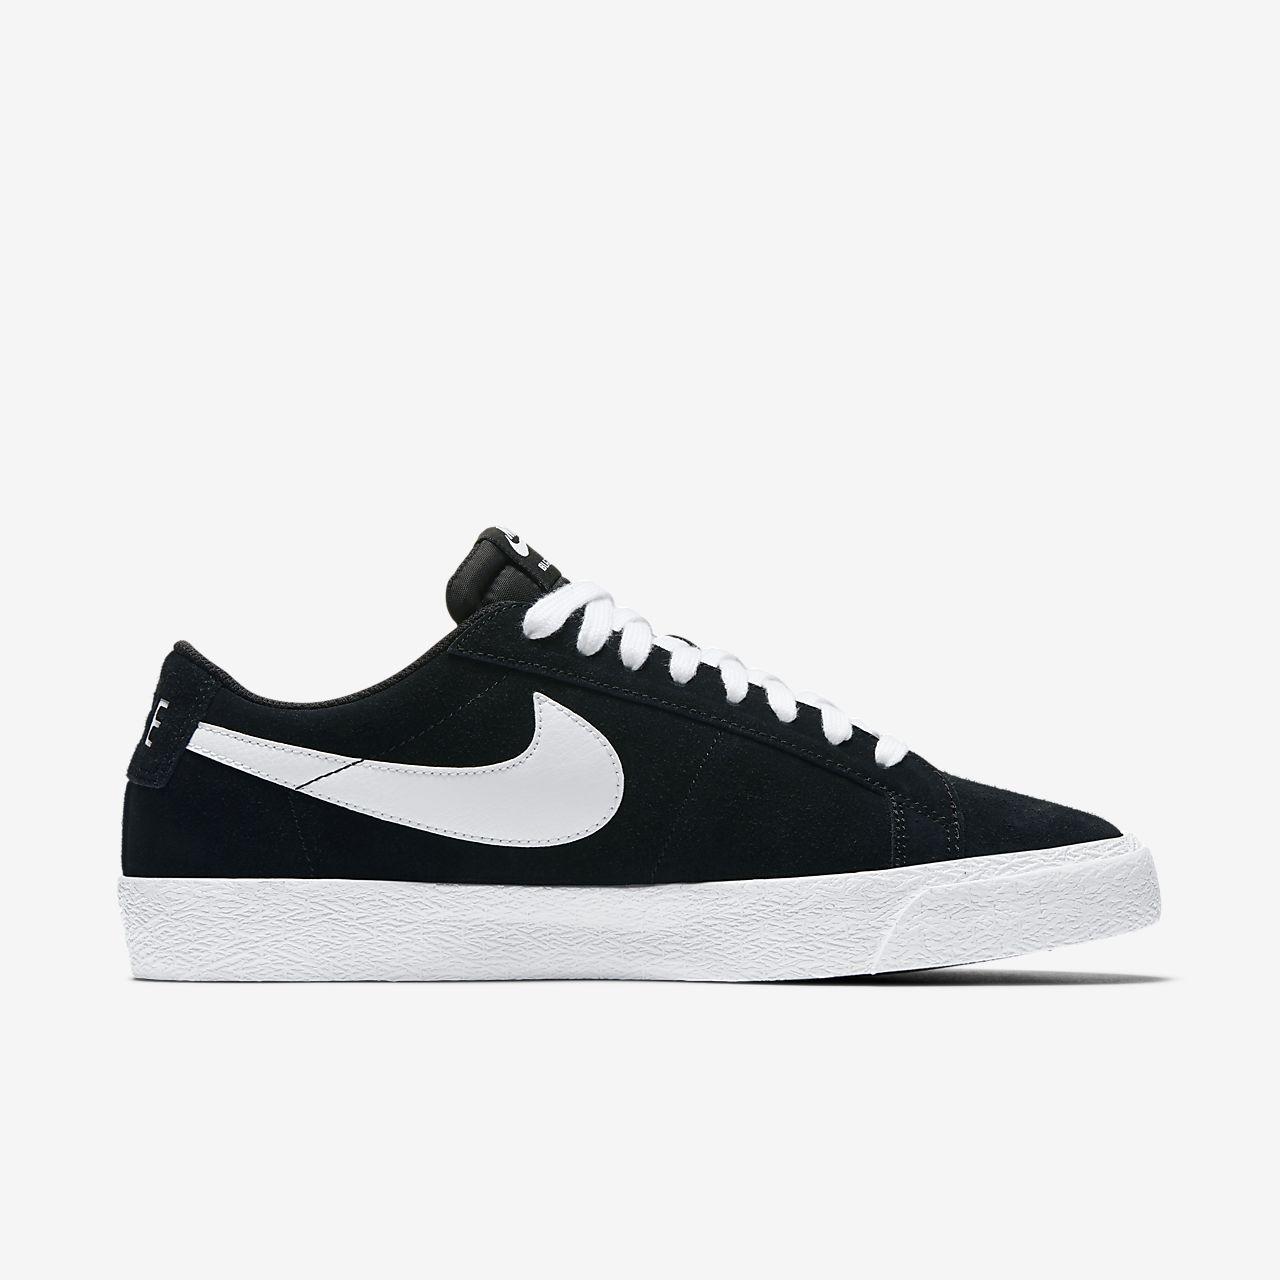 82524c13dfa6 Nike SB Blazer Zoom Low Men s Skateboarding Shoe. Nike.com CA